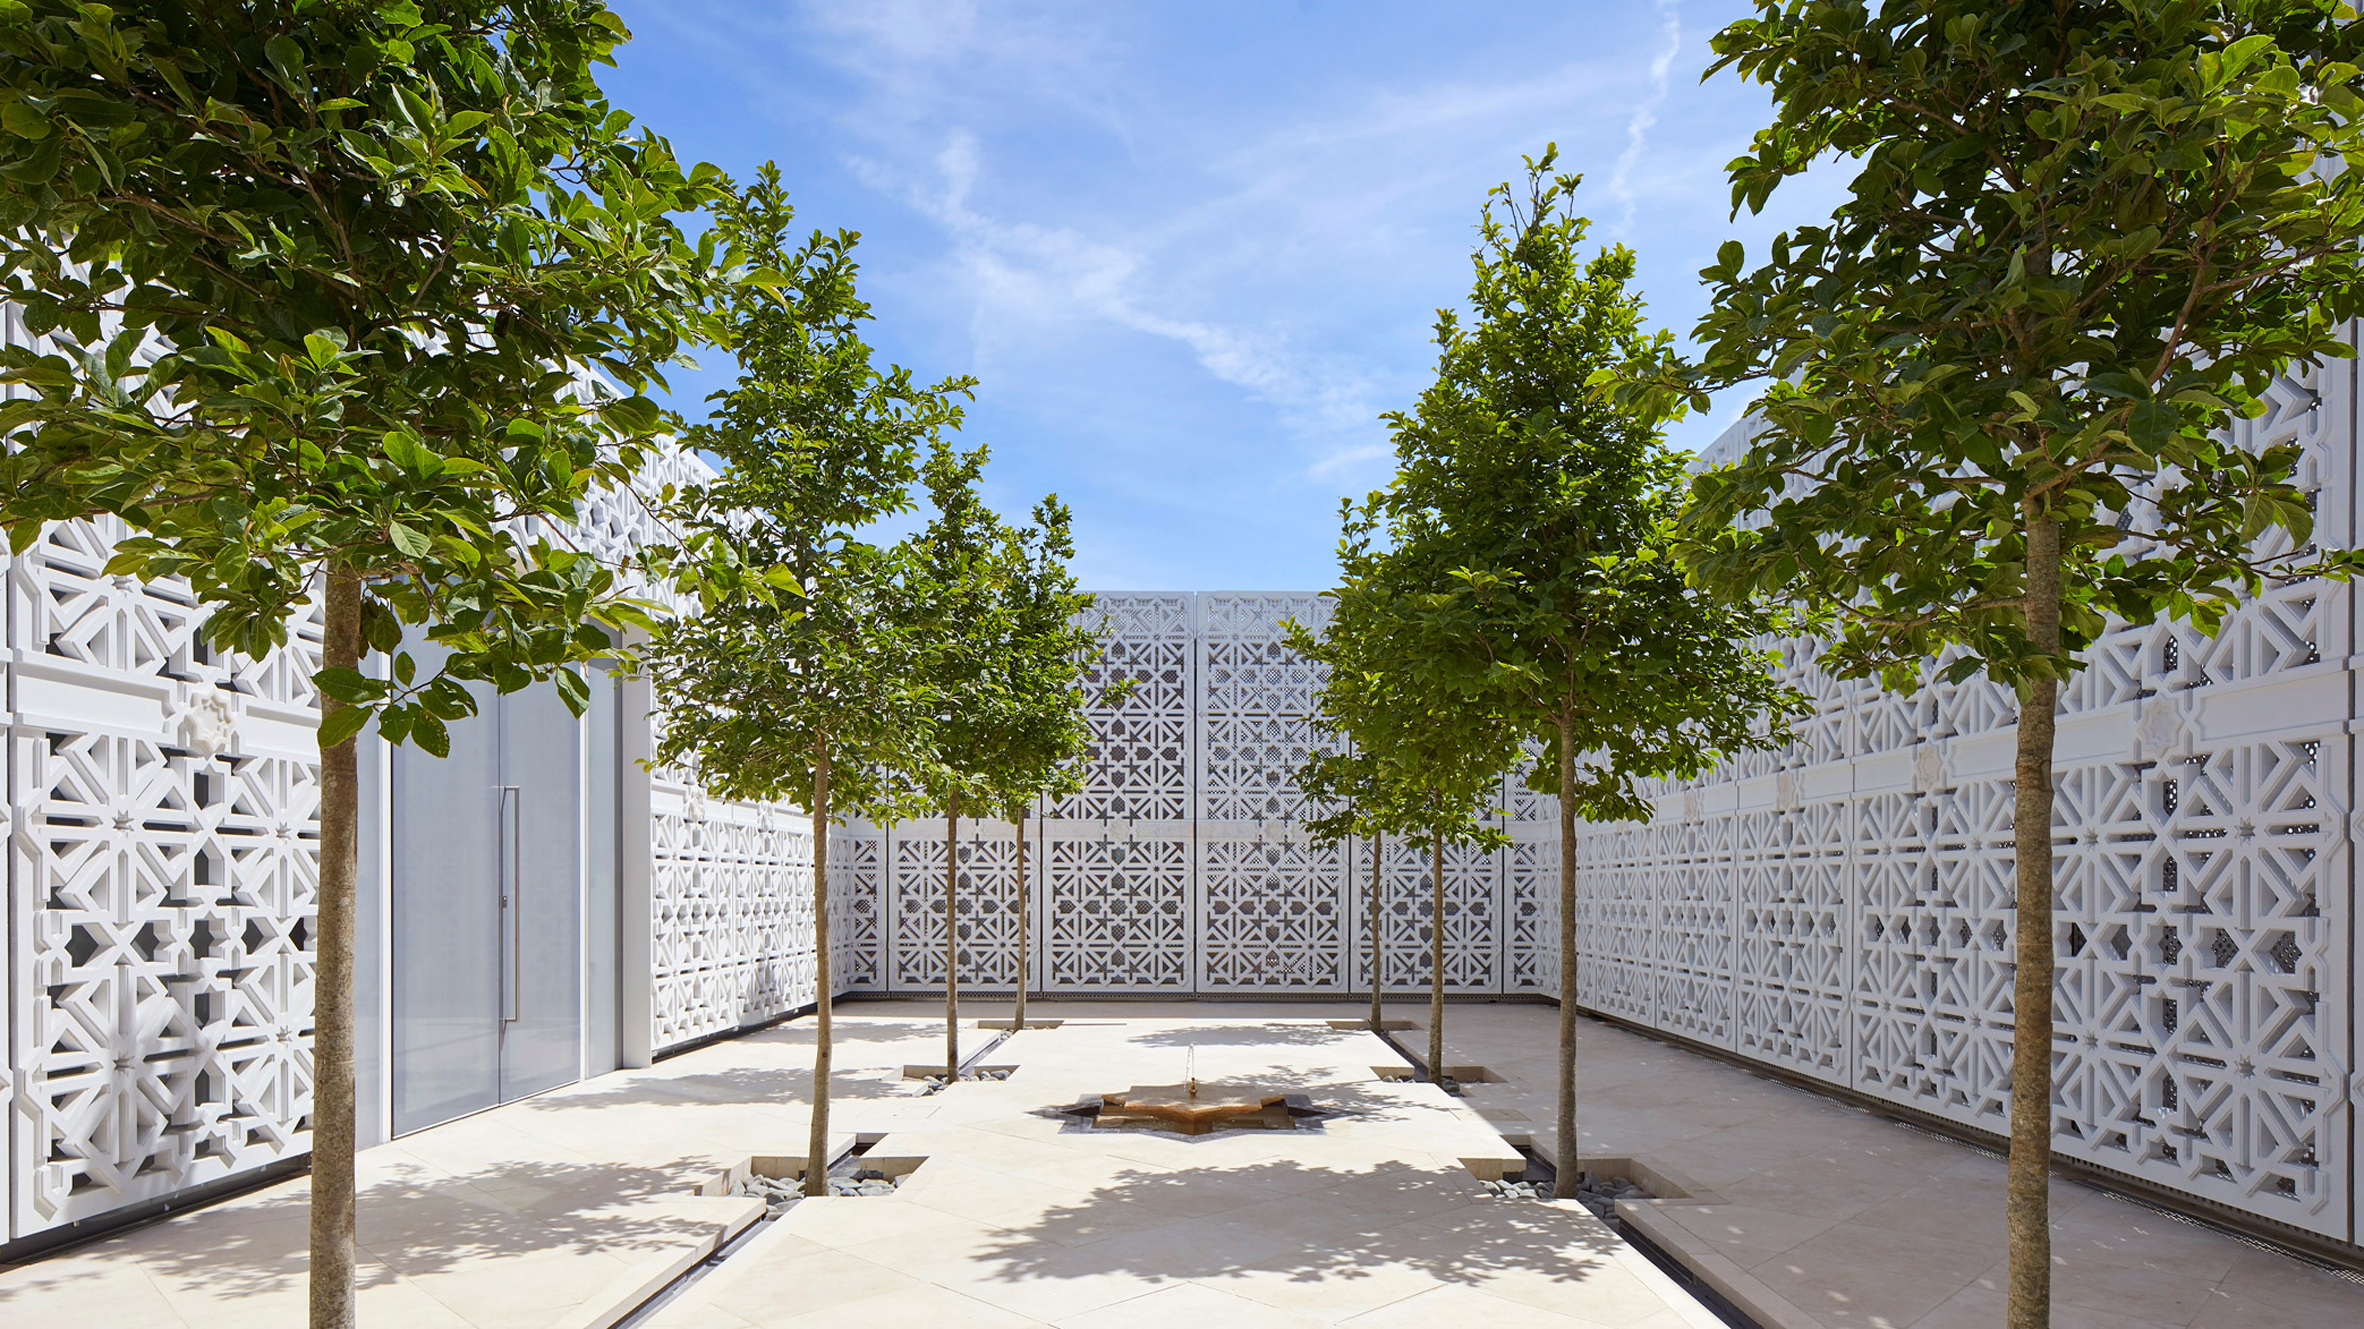 This week, Christo spoke to Dezeen and Fumihiko Maki's Aga Khan Centre completed